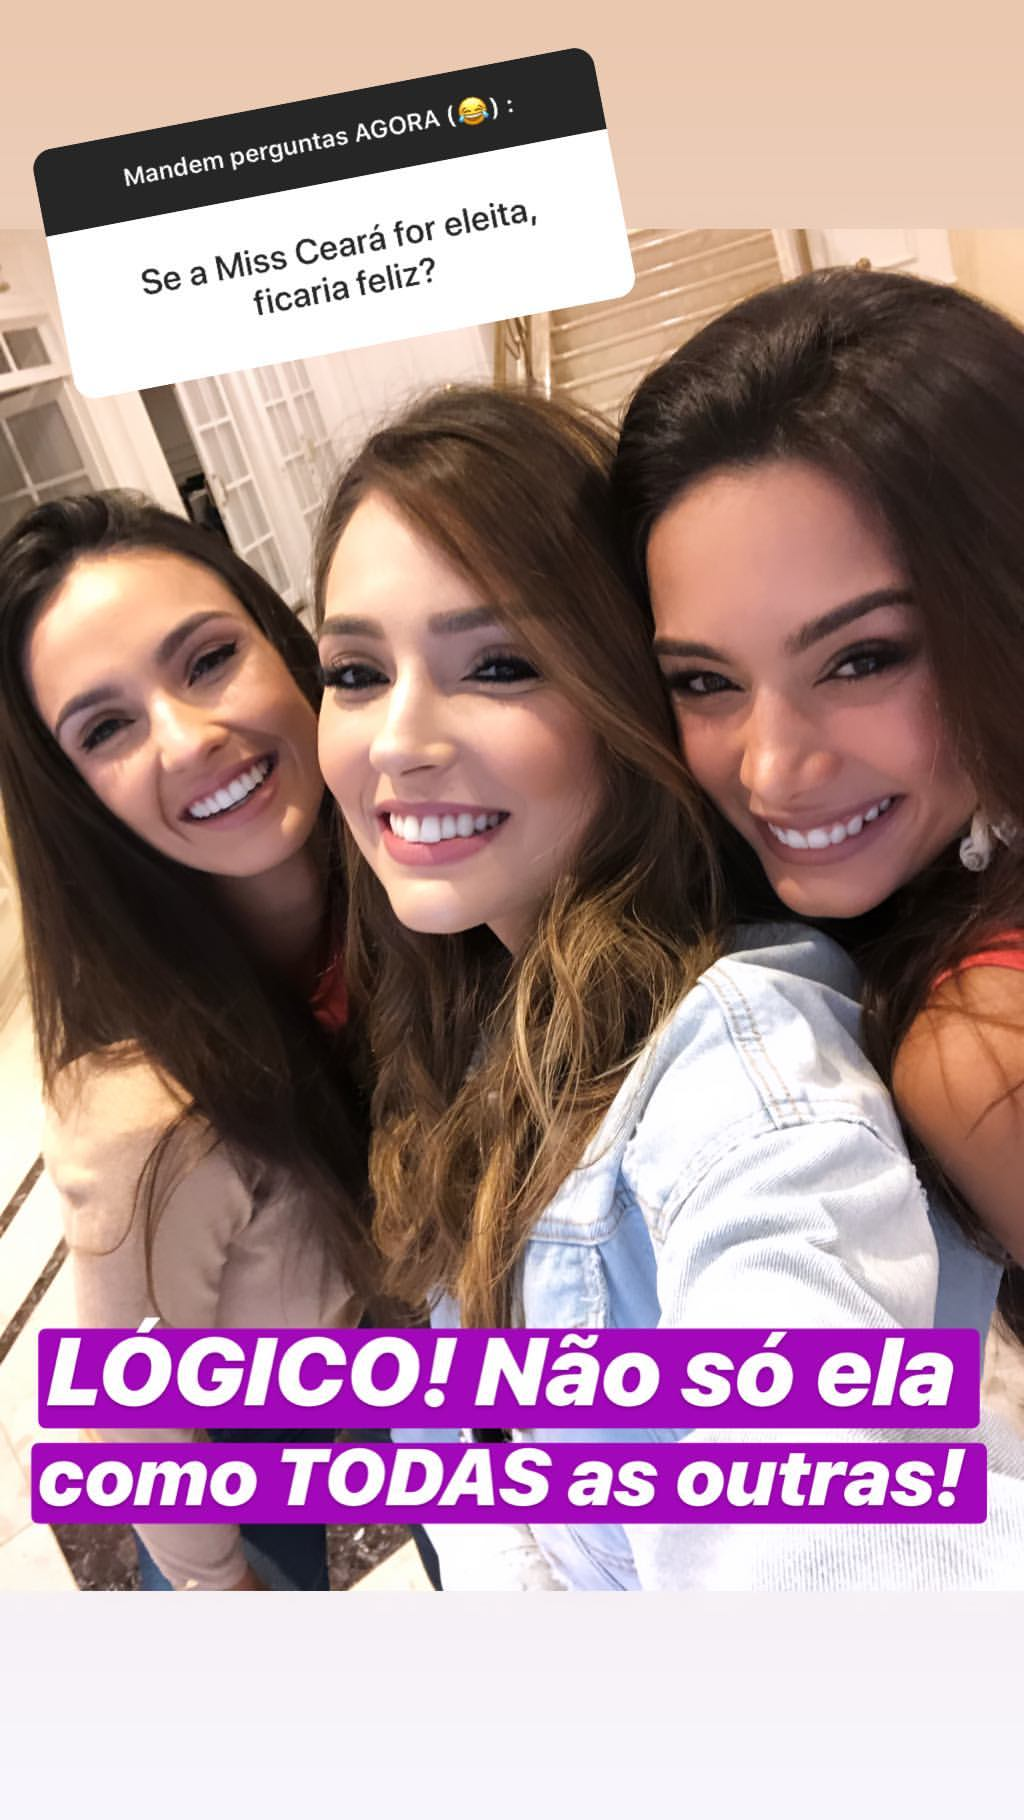 bianca scheren, top 5 de miss brasil universo 2019. - Página 9 52681212